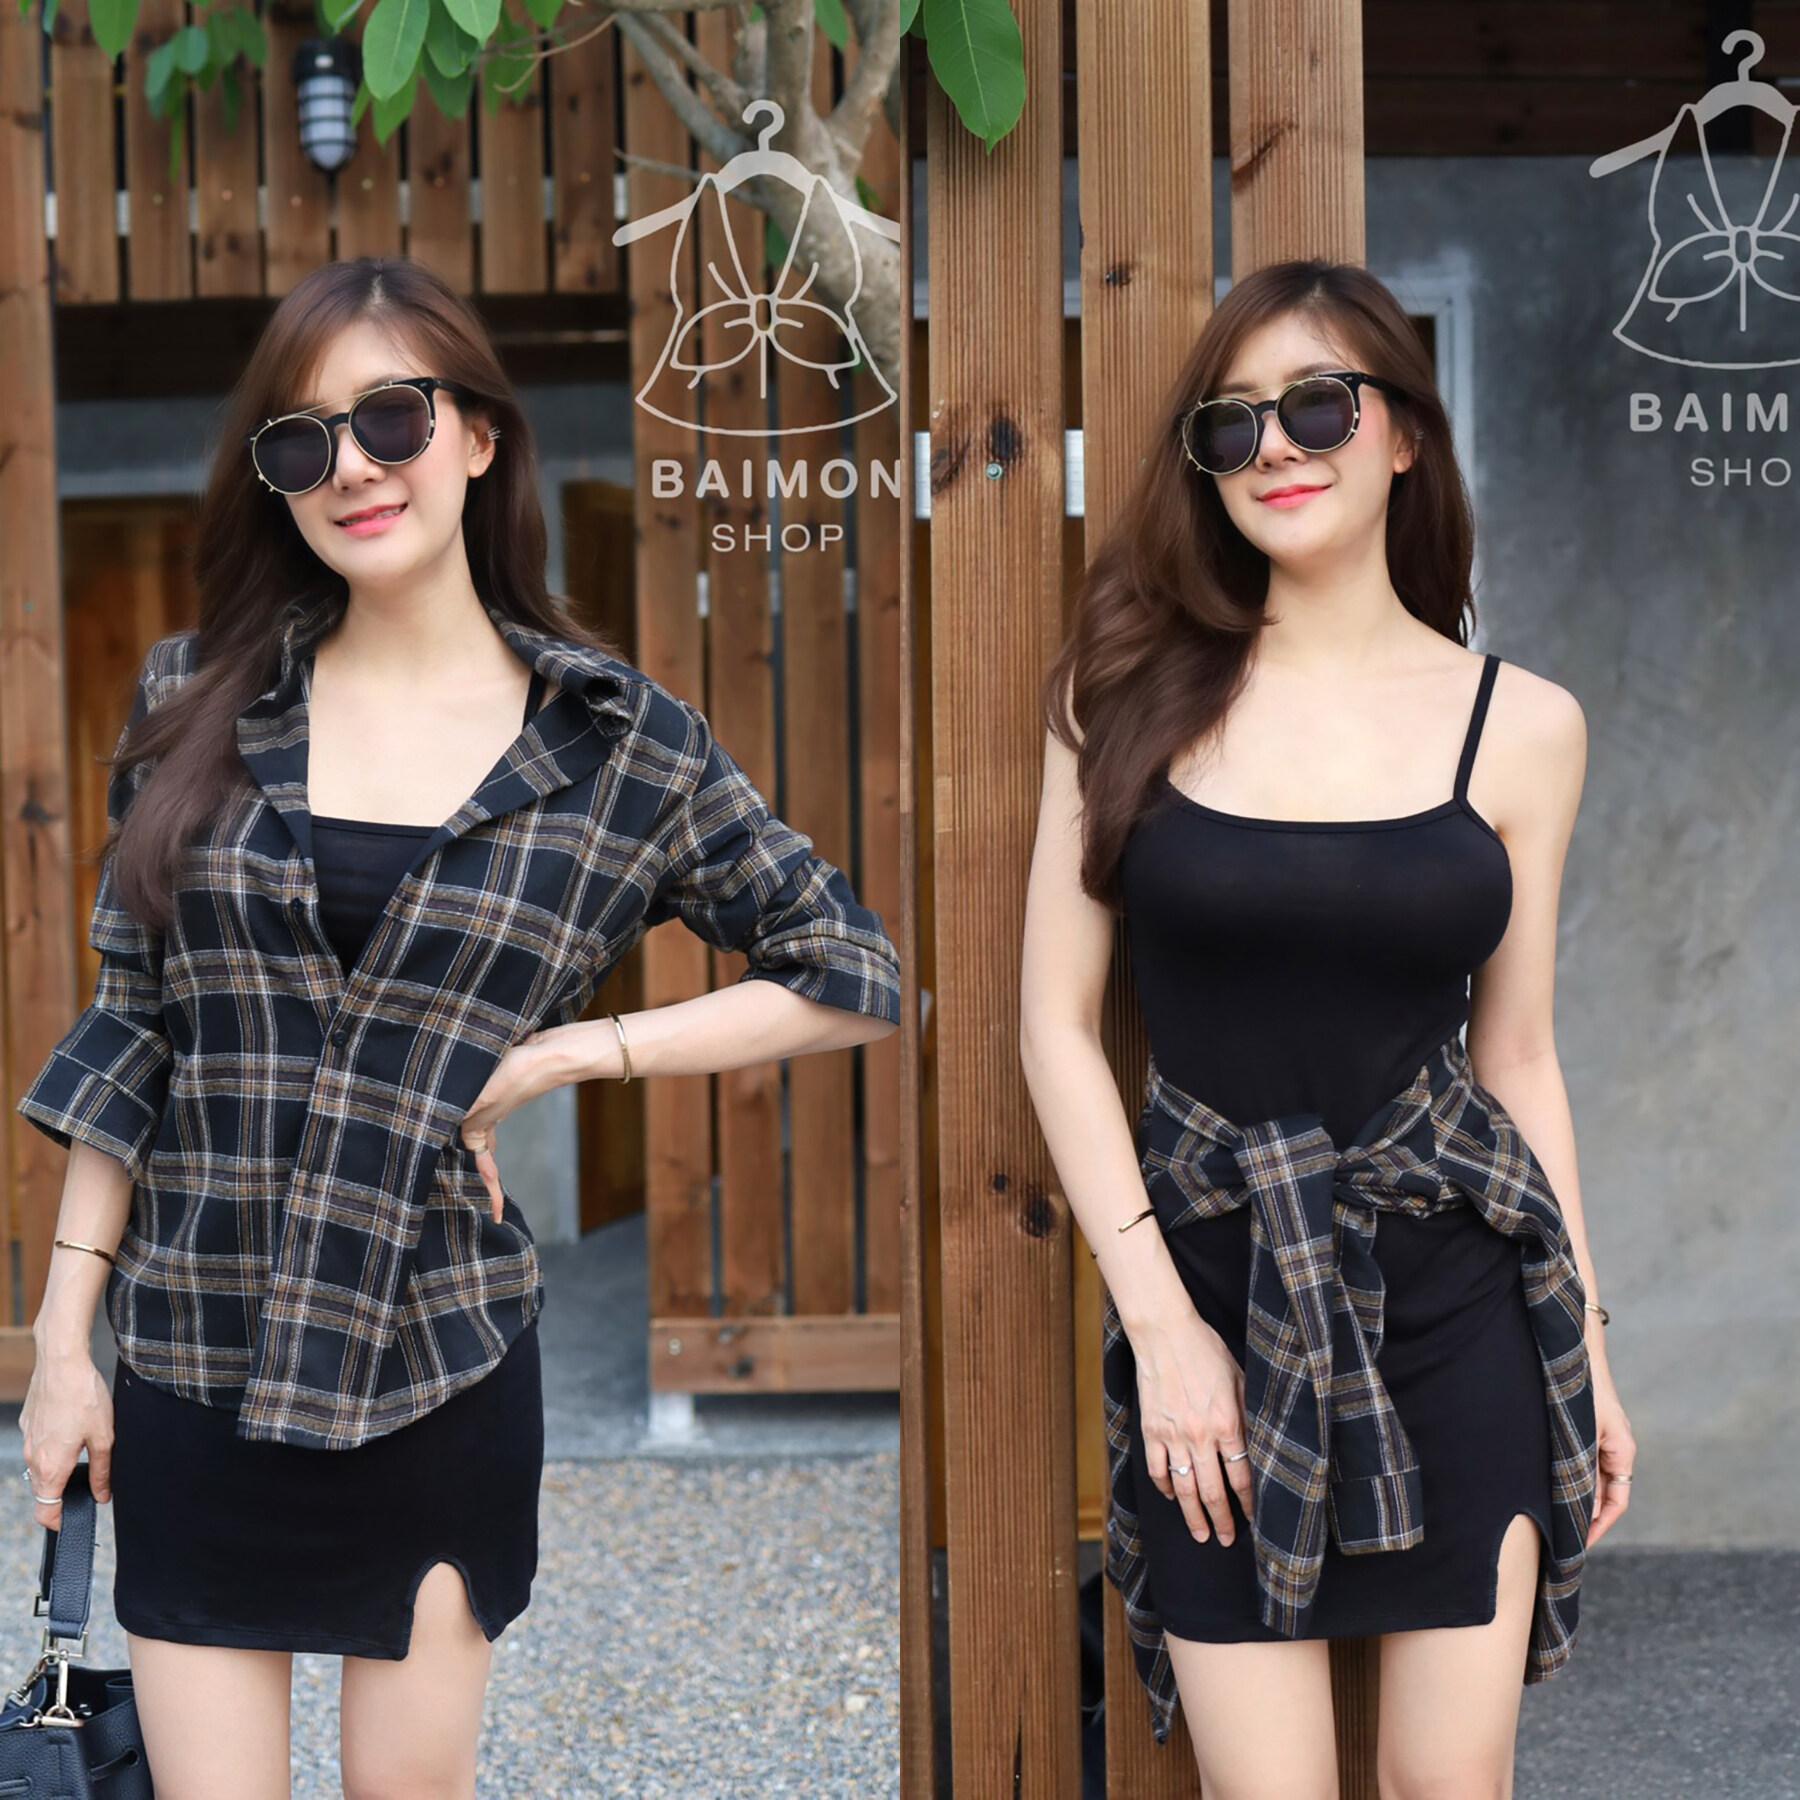 Ba019 Tara Set 2 ชิ้น เสื้อเชิ้ต + เดรสสายเดี่ยว ลายสก็อต ผ้าคอตตอนญี่ปุ่น.